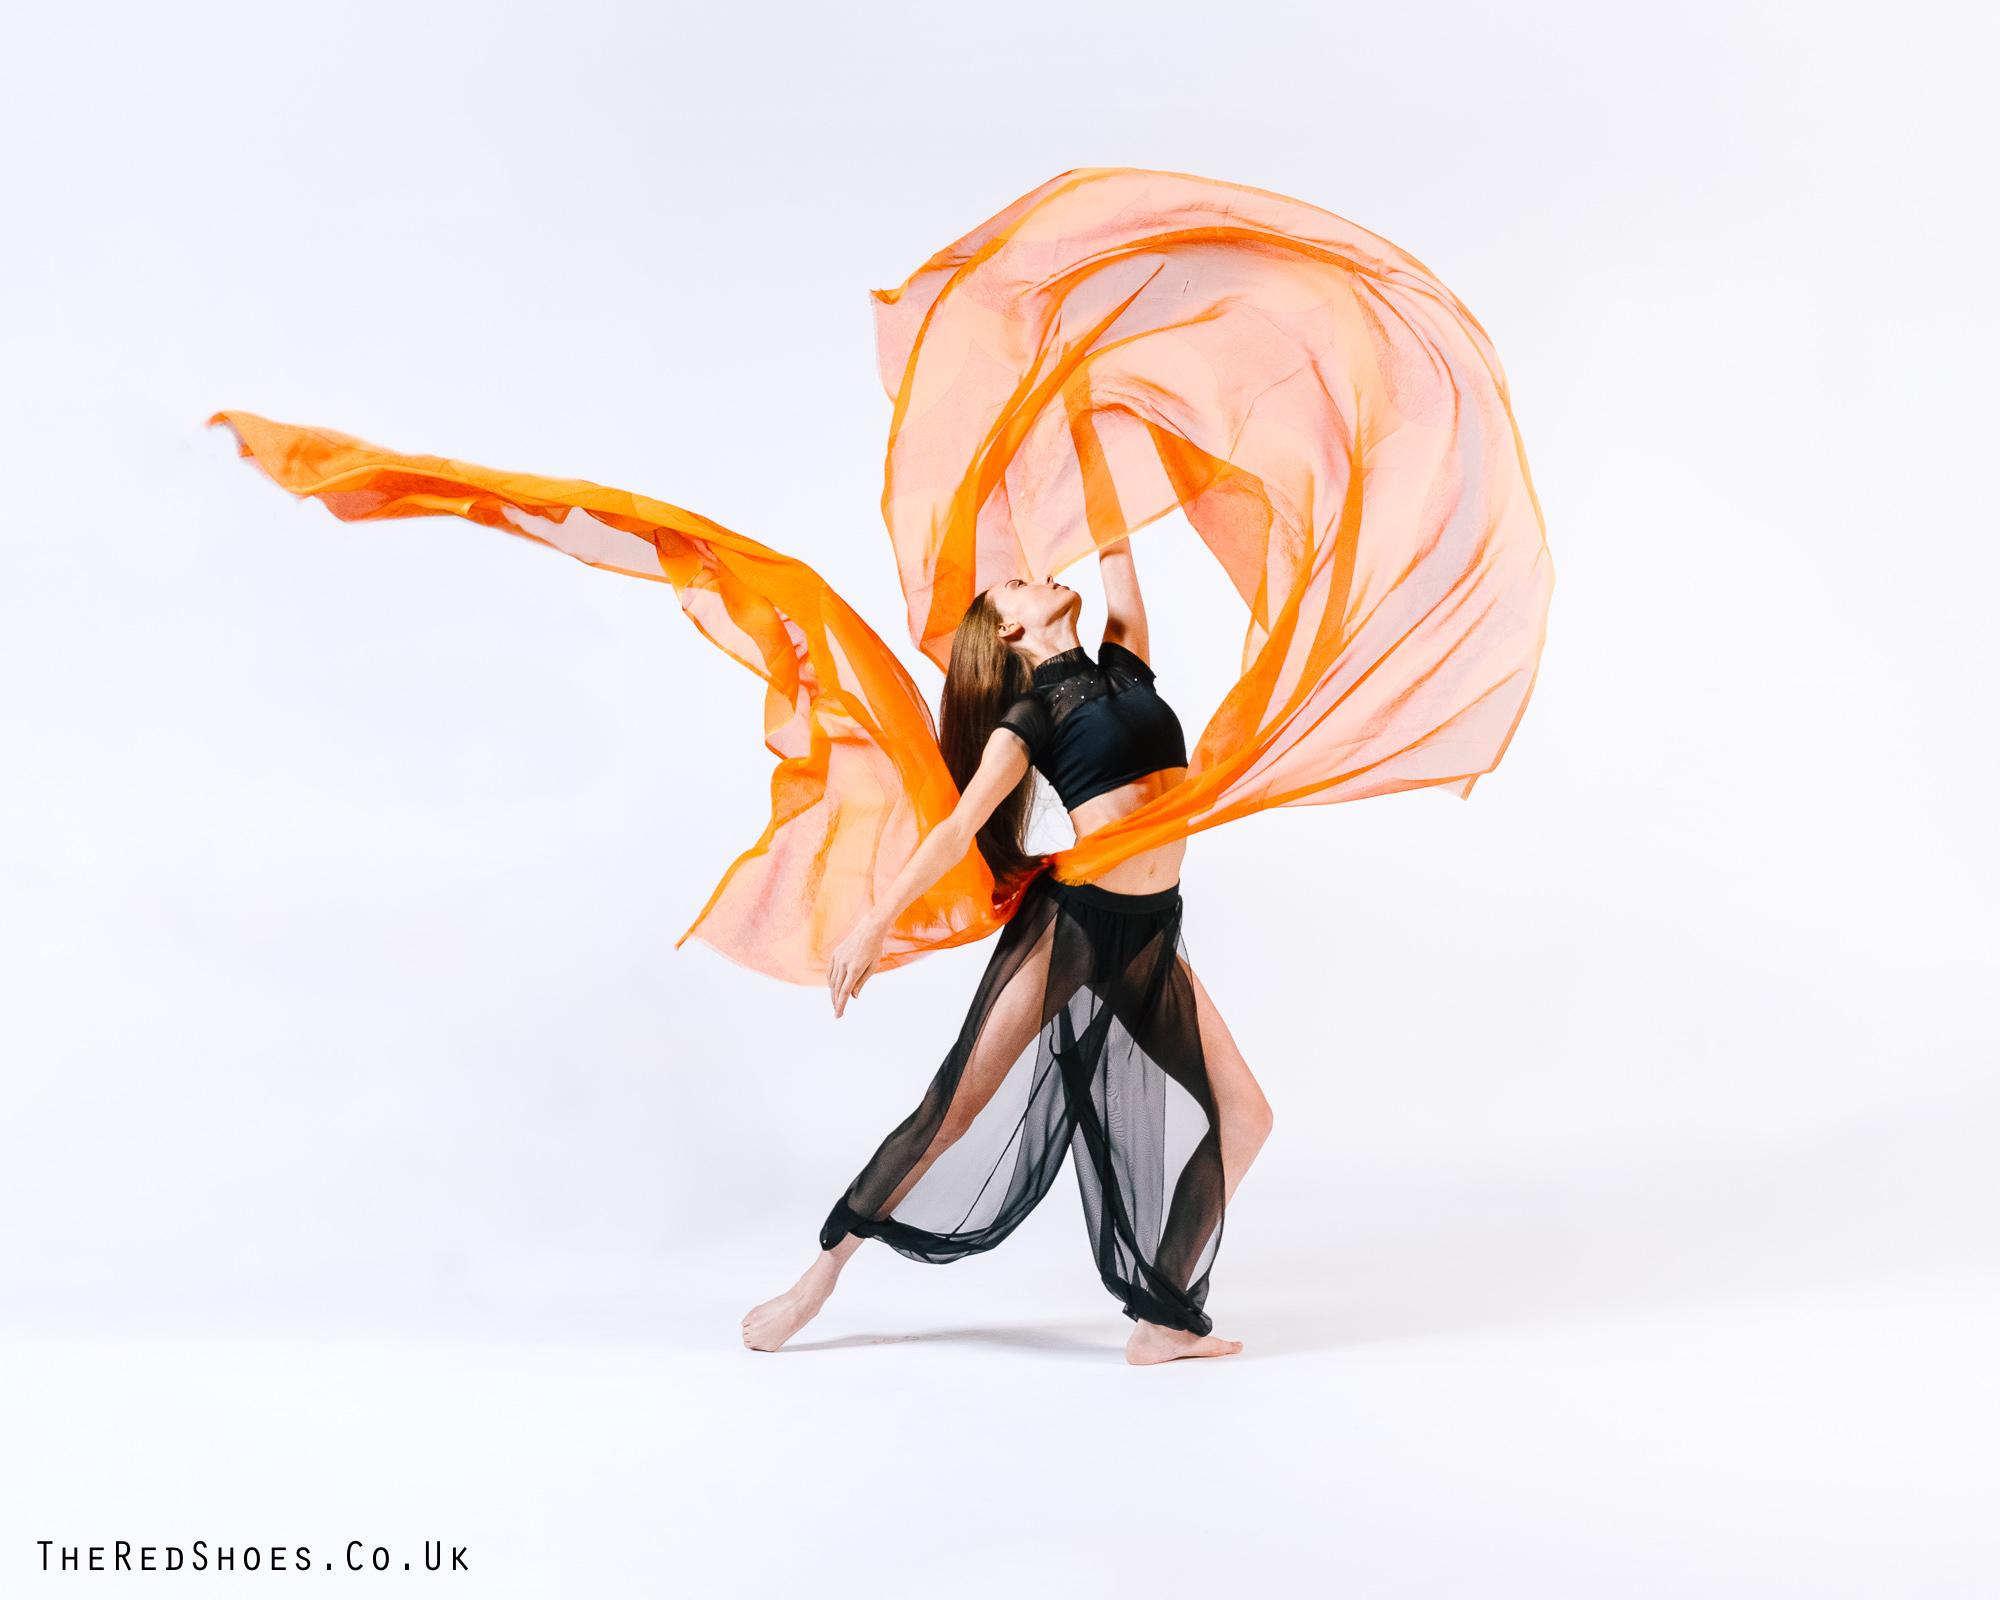 dance-photography-23.jpg